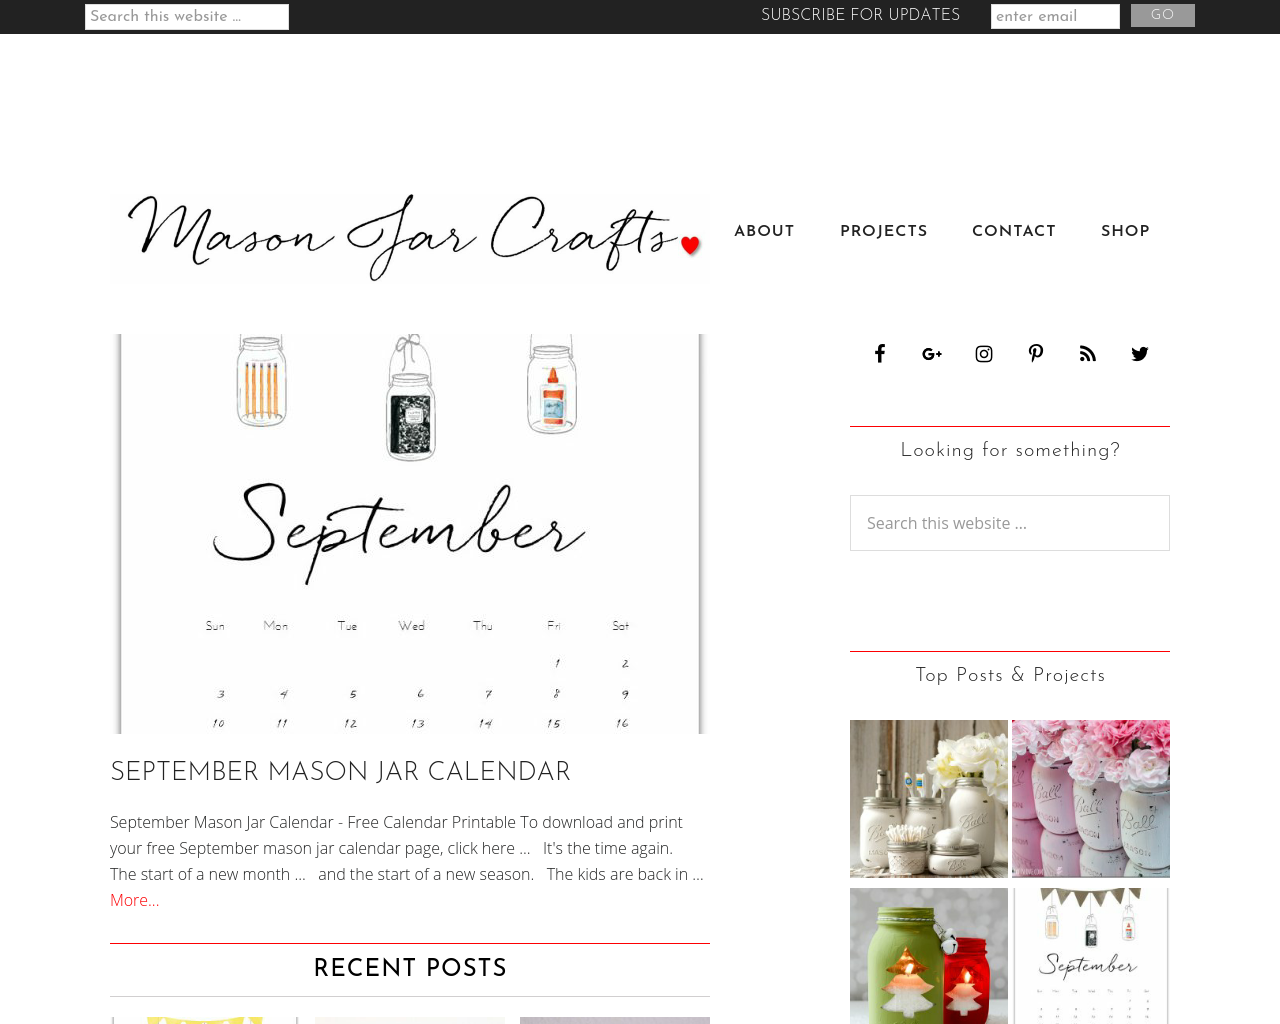 MASON-JAR-Crafts-LOVE-Advertising-Reviews-Pricing